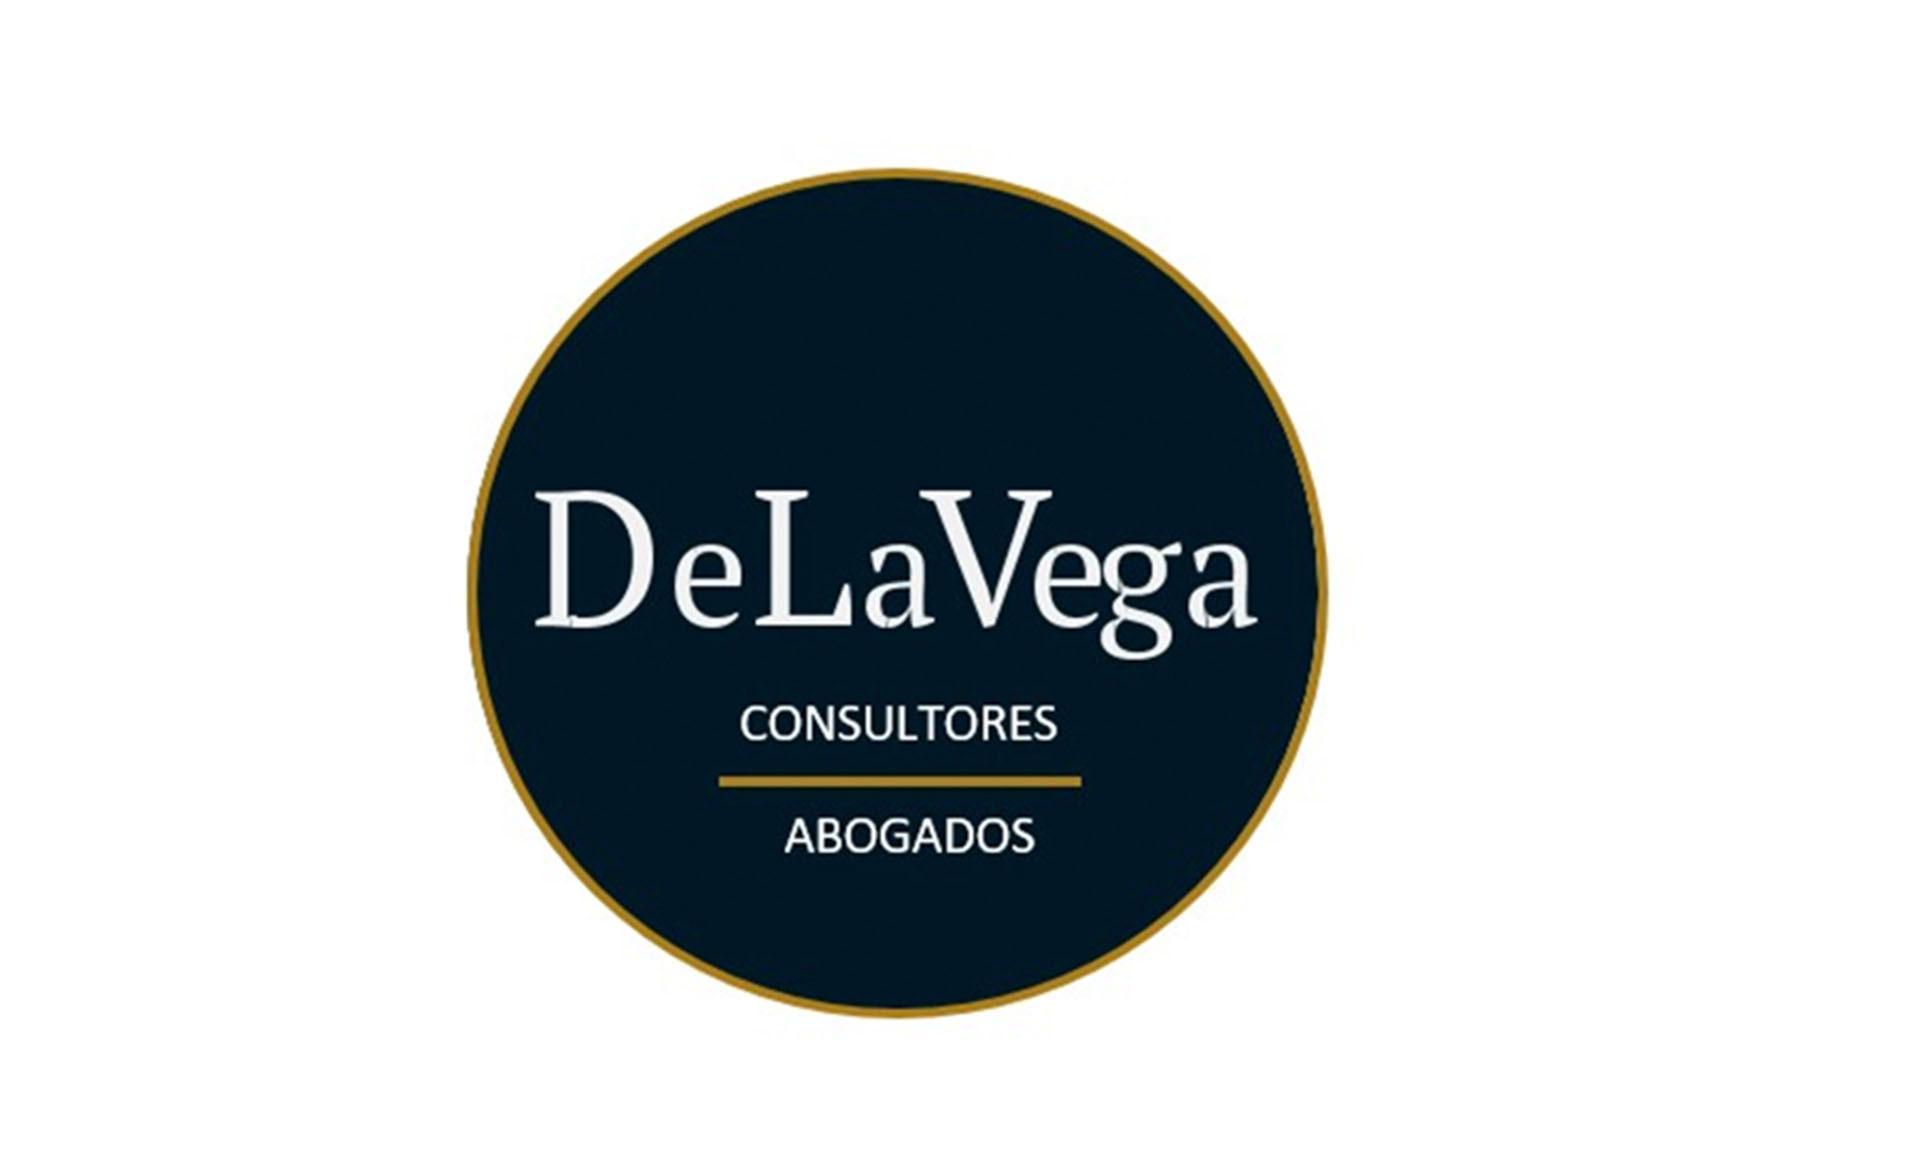 logo-red_0007_b2.-Logo-De-La-Vega-Consultores-Legales